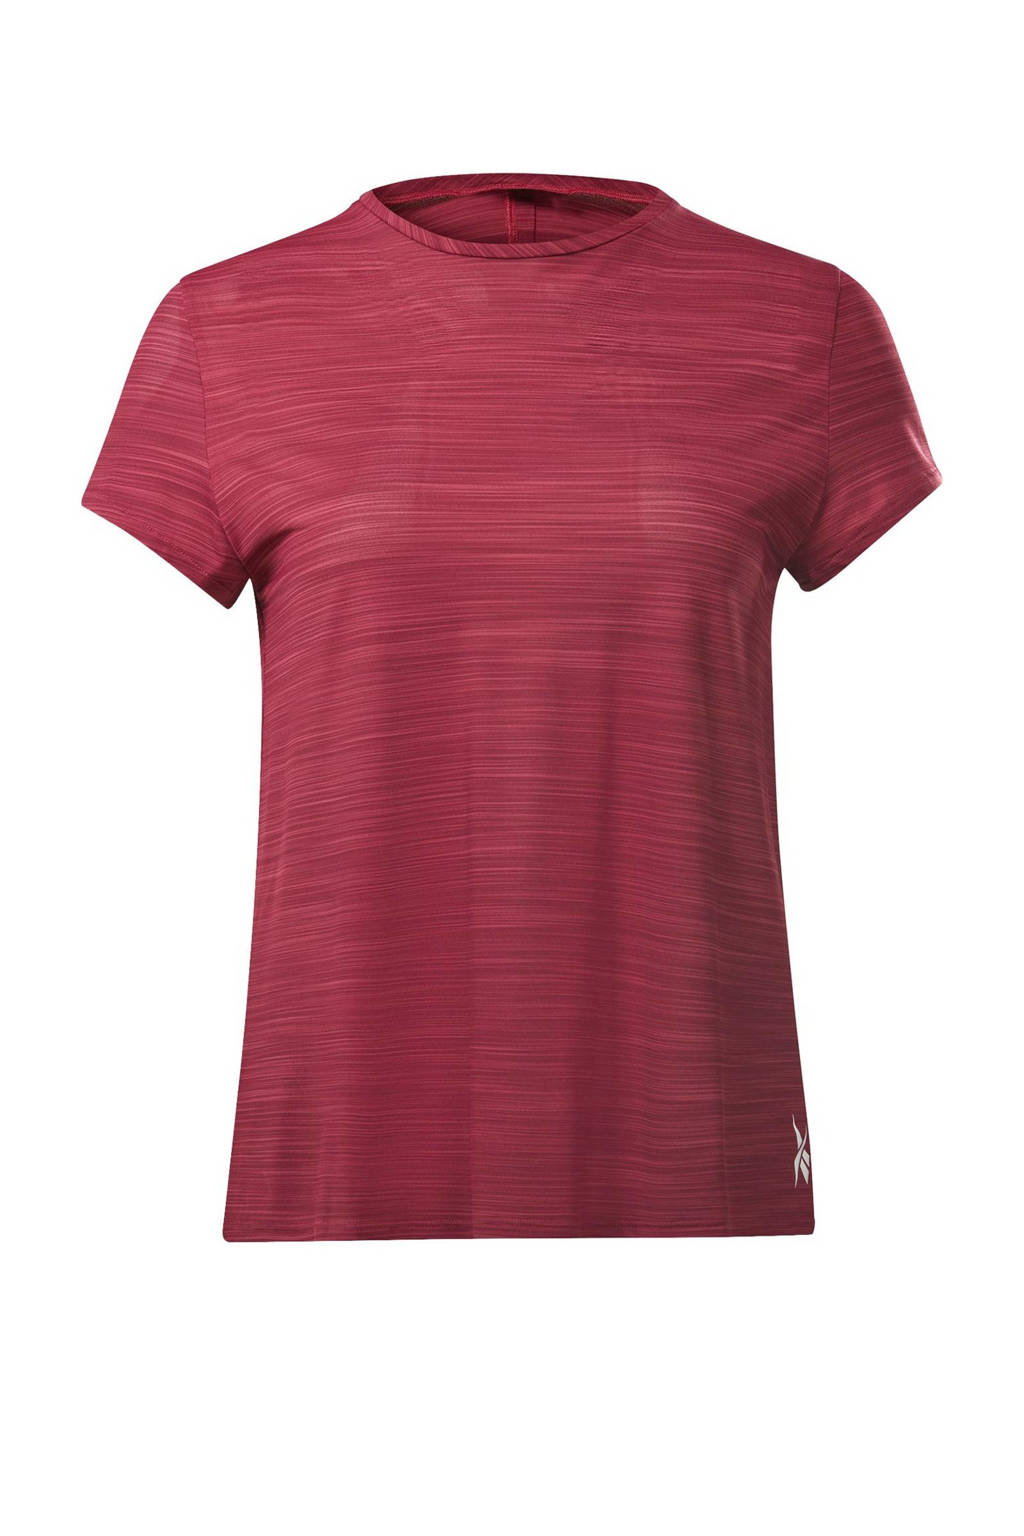 Reebok Training sport T-shirt rood, Rood